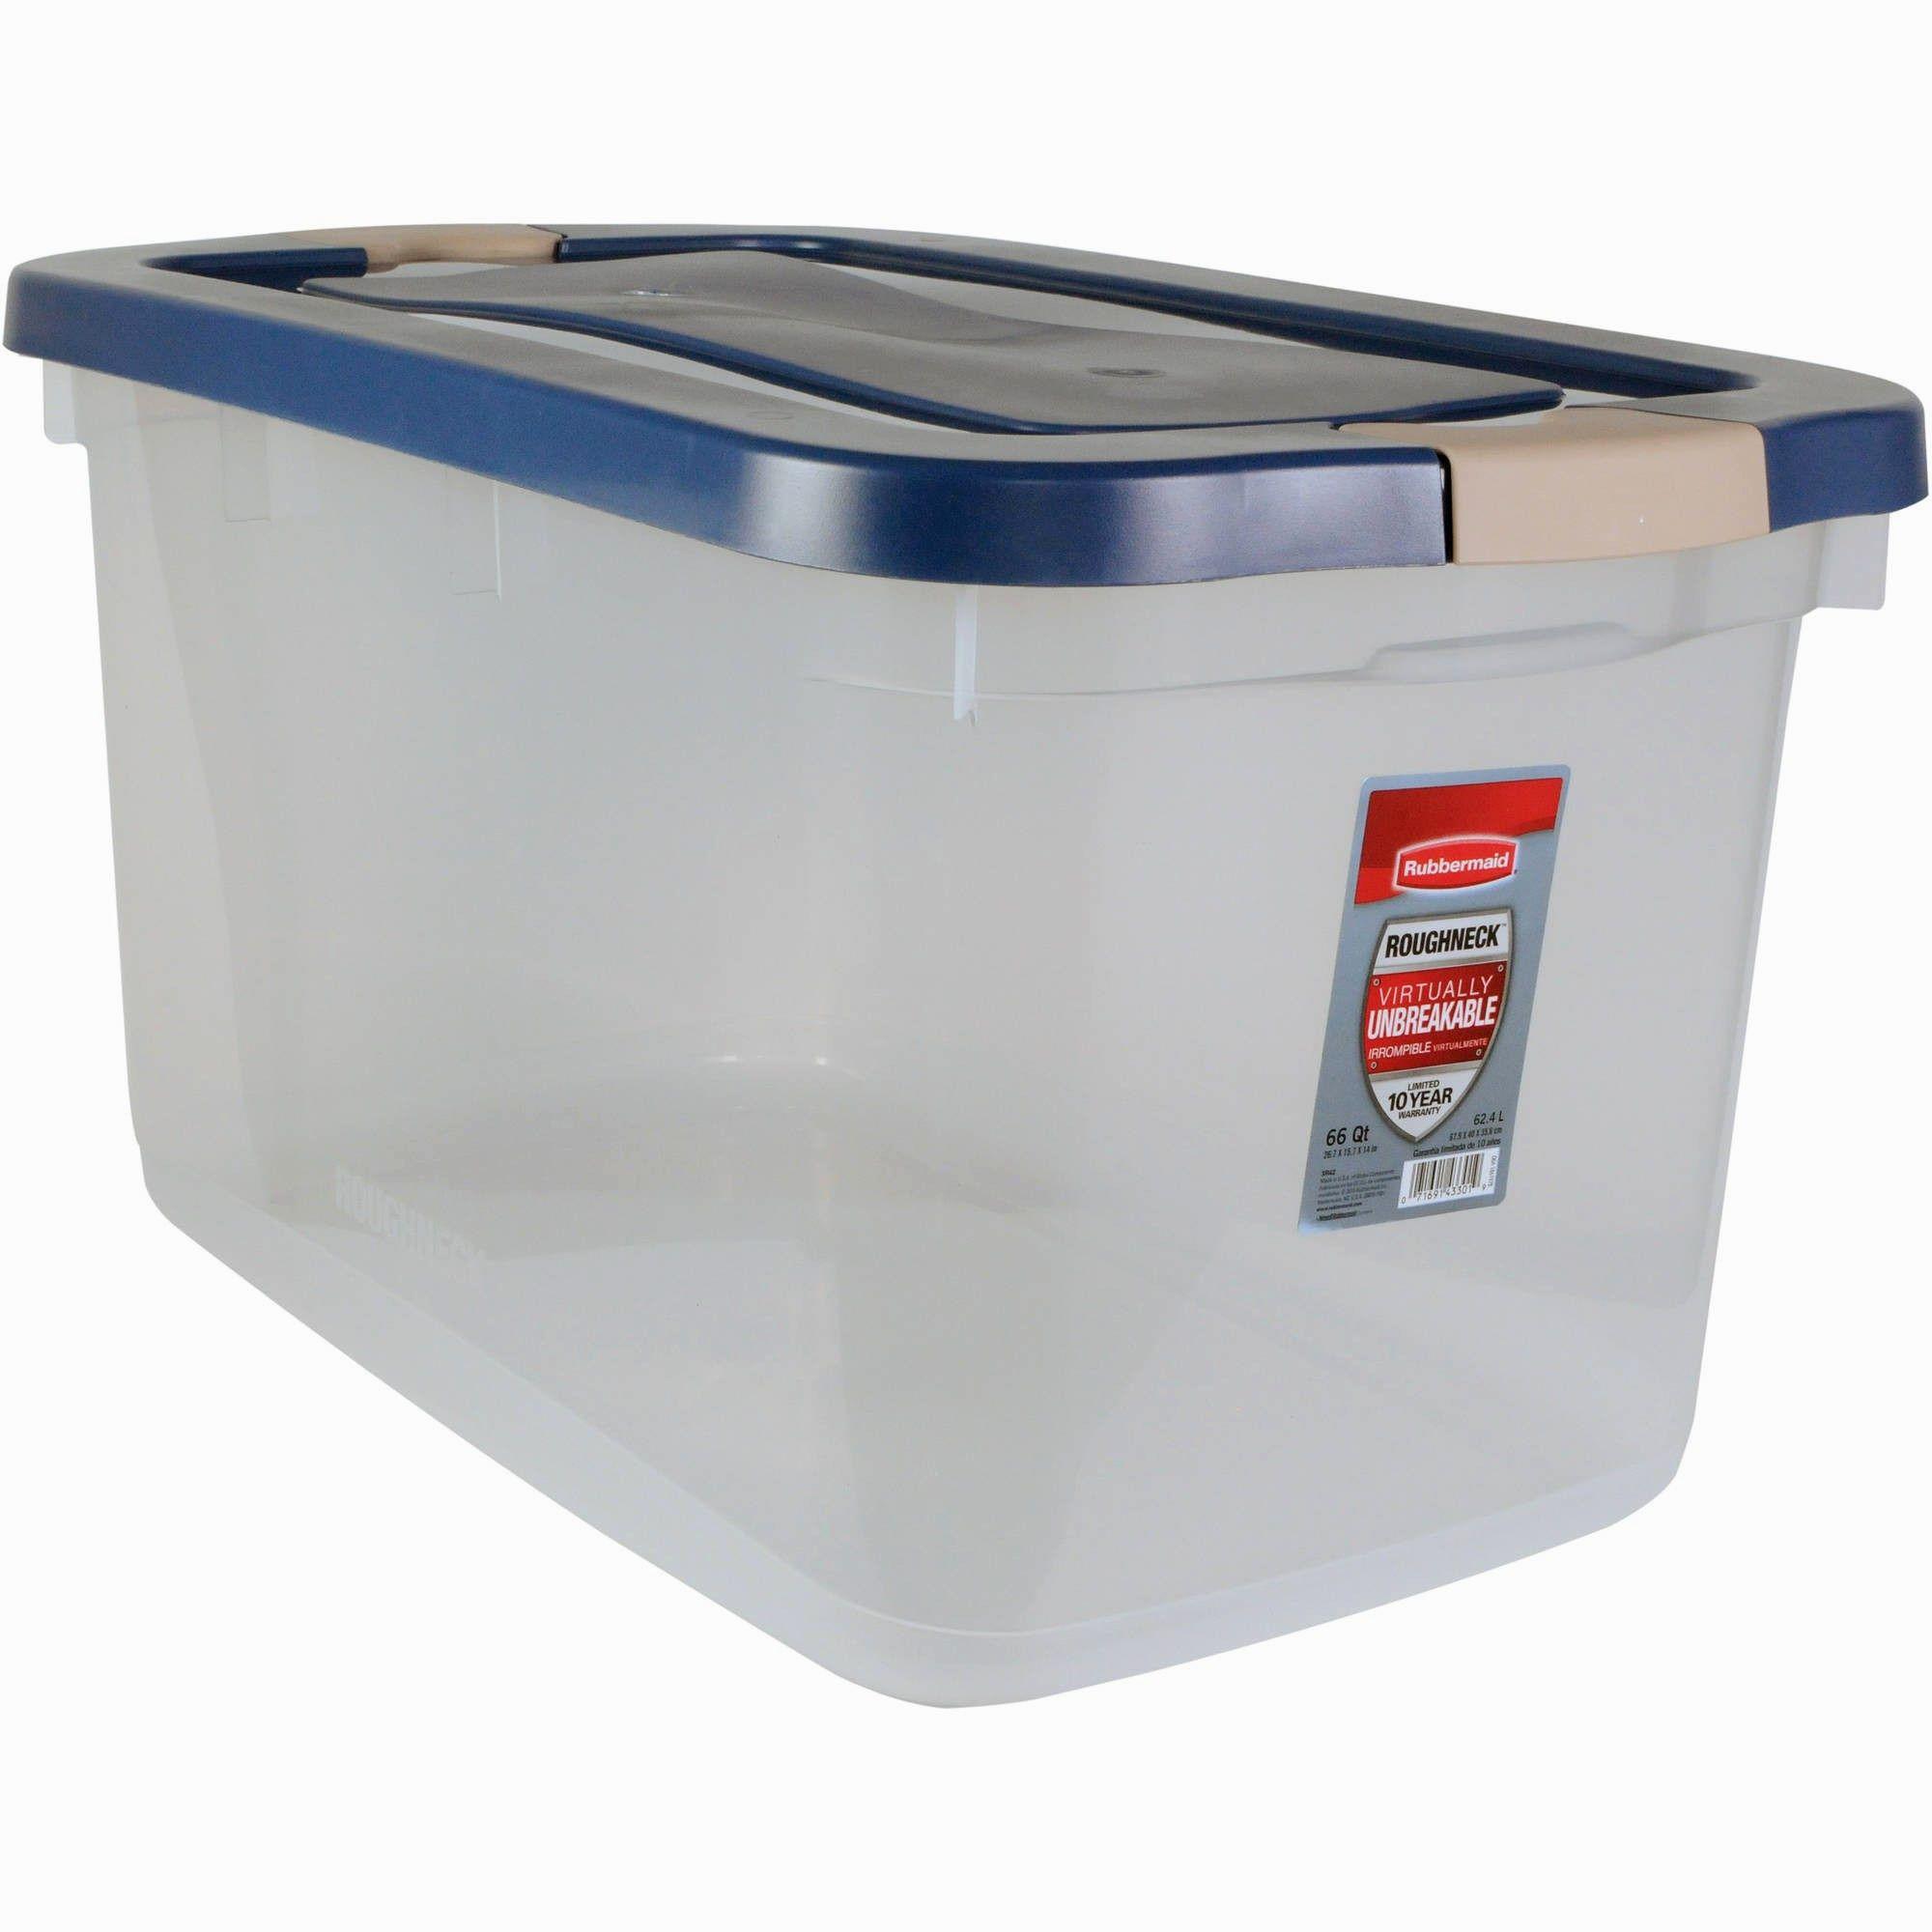 Elegant Bathroom Decor: Elegant Bathroom Storage Containers Décor